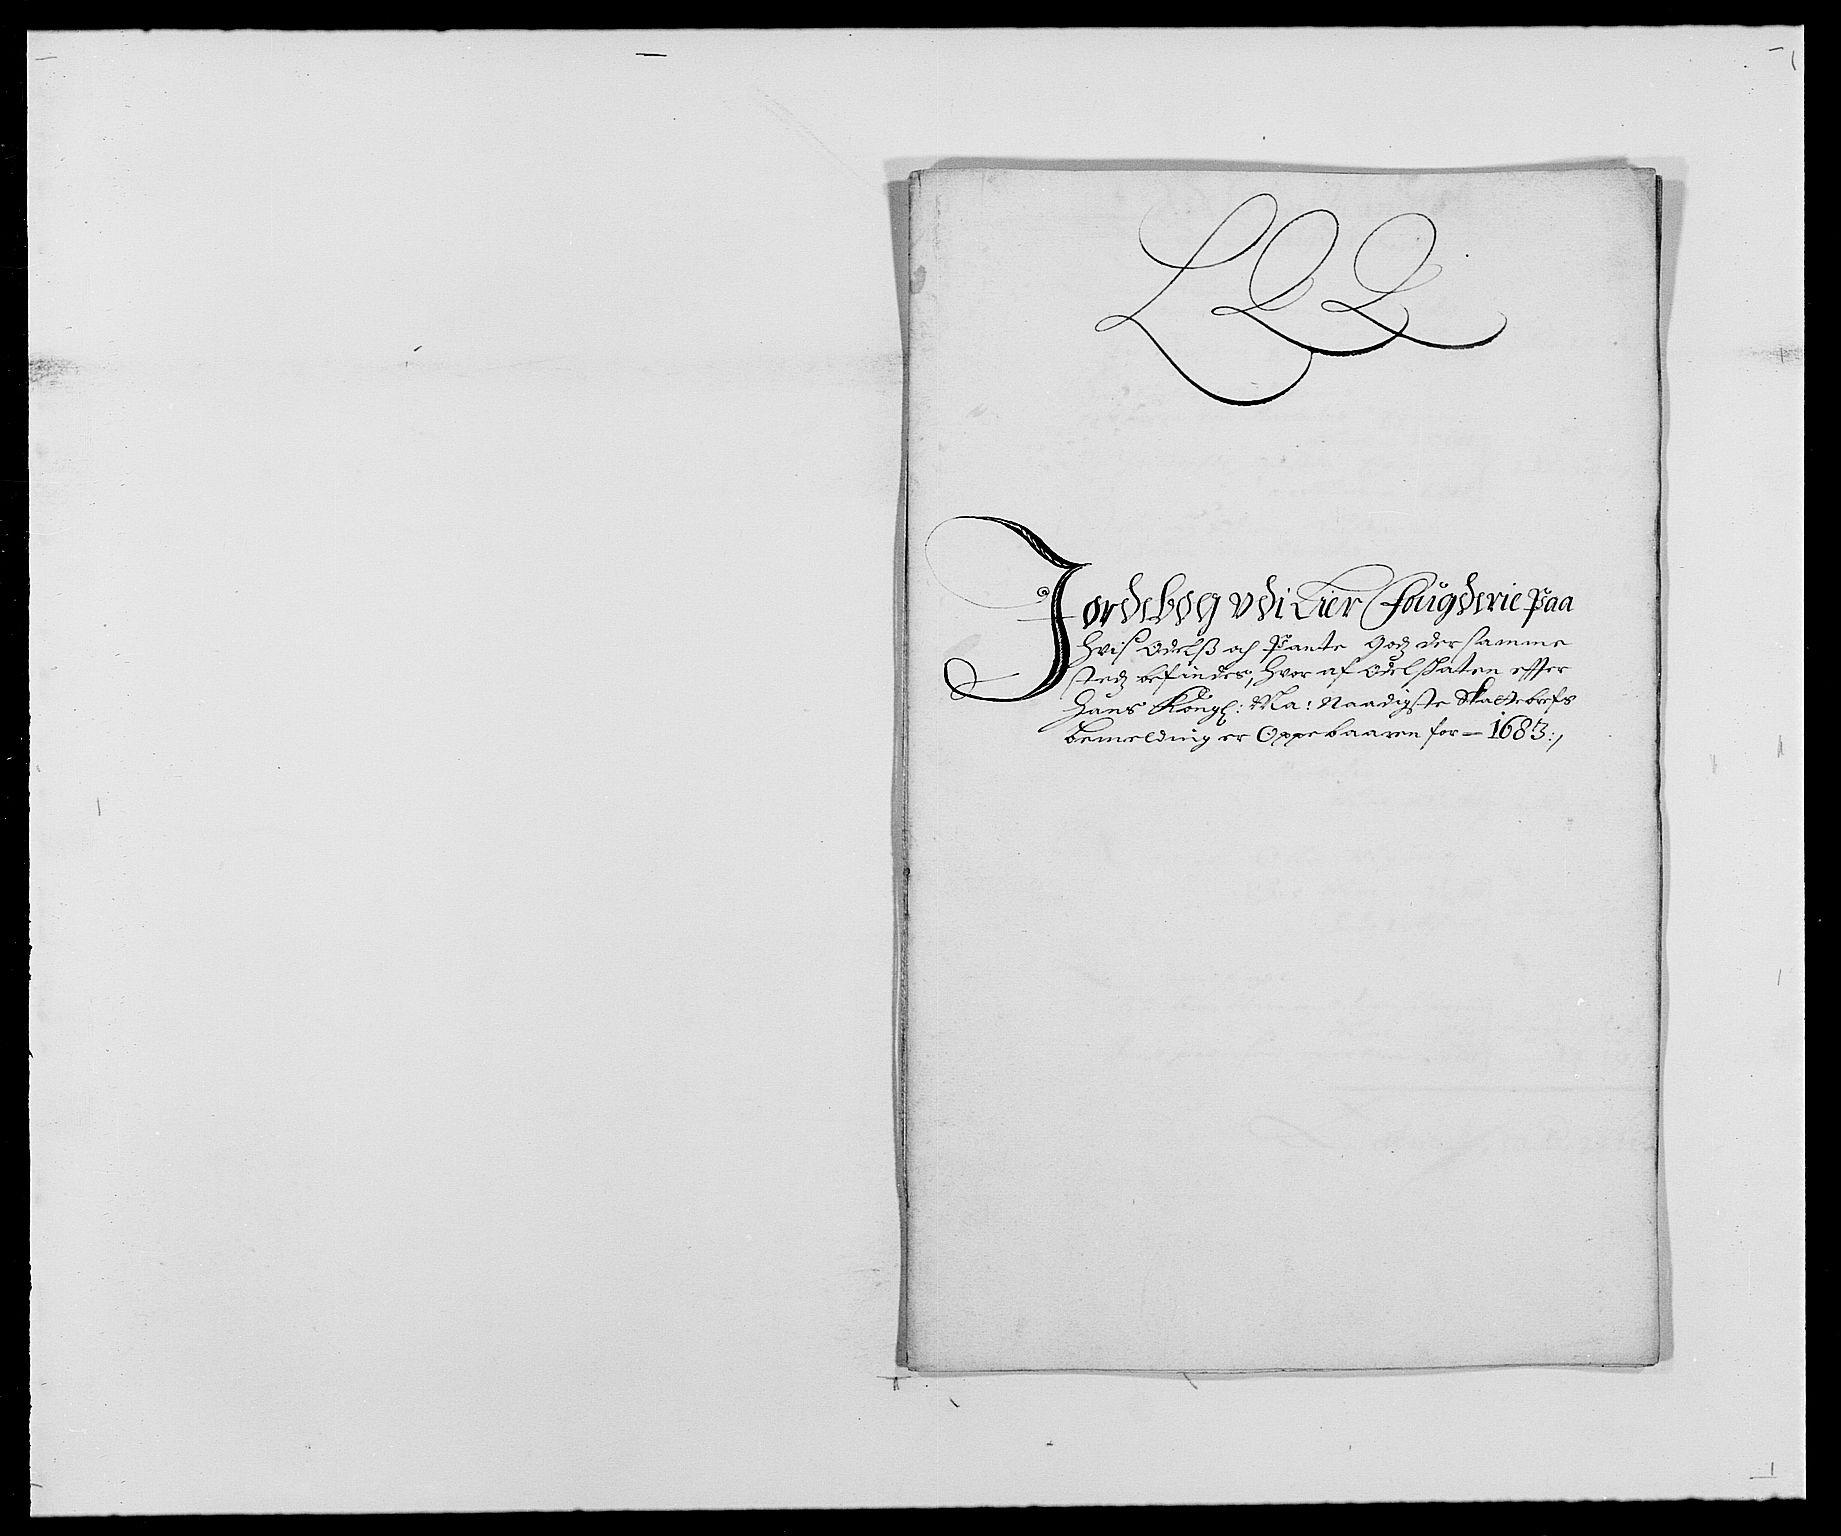 RA, Rentekammeret inntil 1814, Reviderte regnskaper, Fogderegnskap, R27/L1687: Fogderegnskap Lier, 1678-1686, s. 17